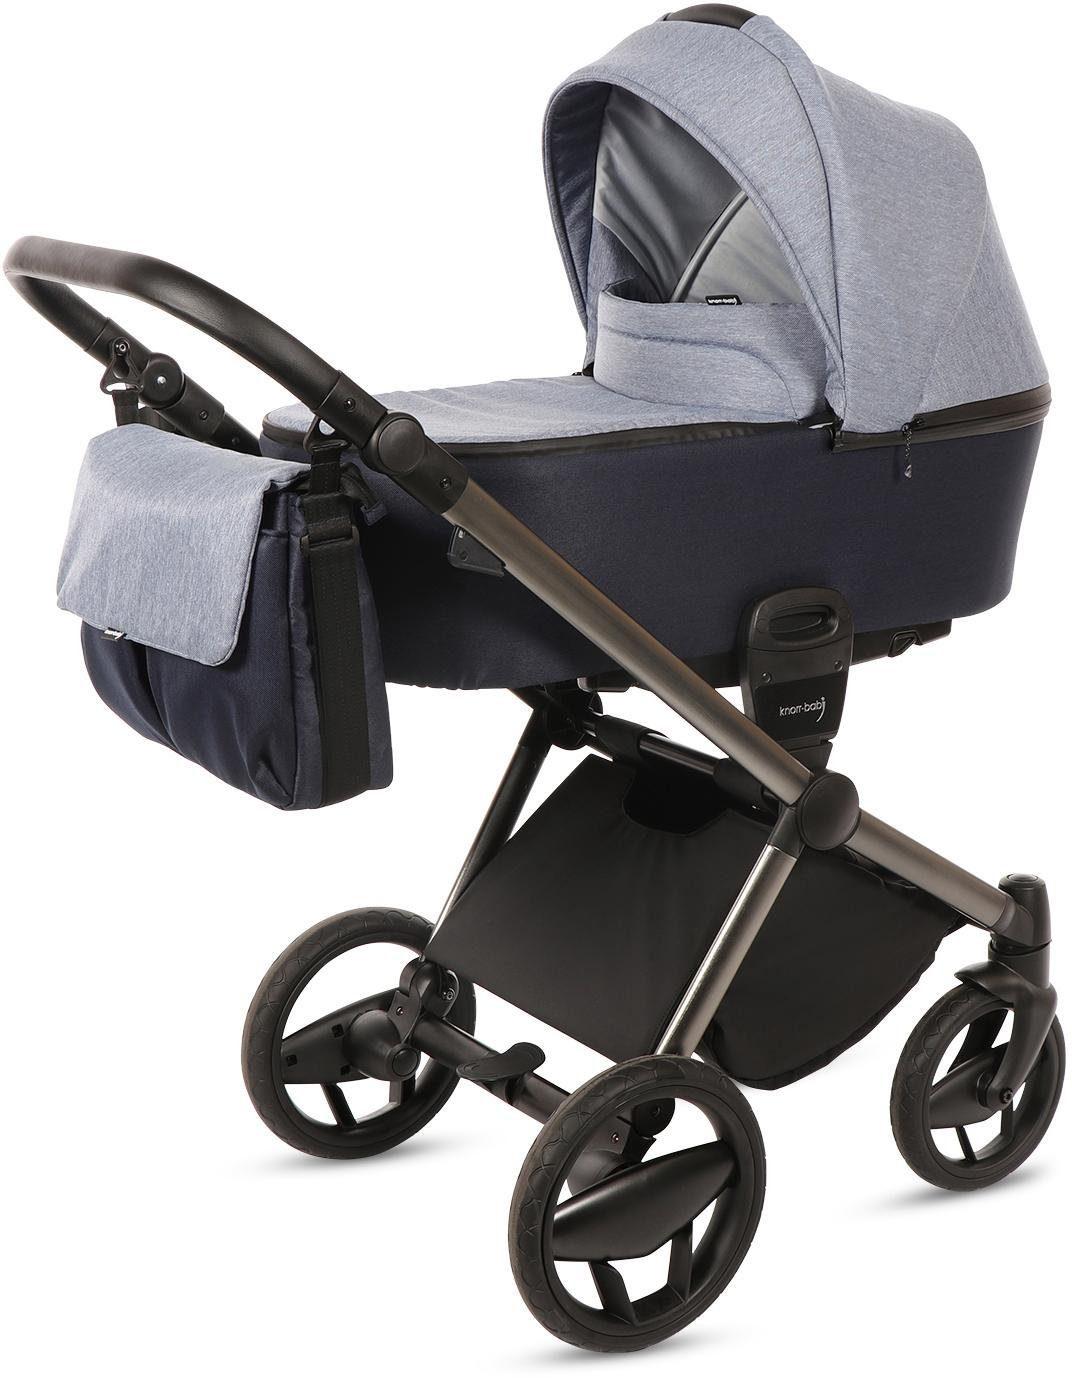 knorr-baby Kombi-Kinderwagen, »Life+, jeansblau-marine«